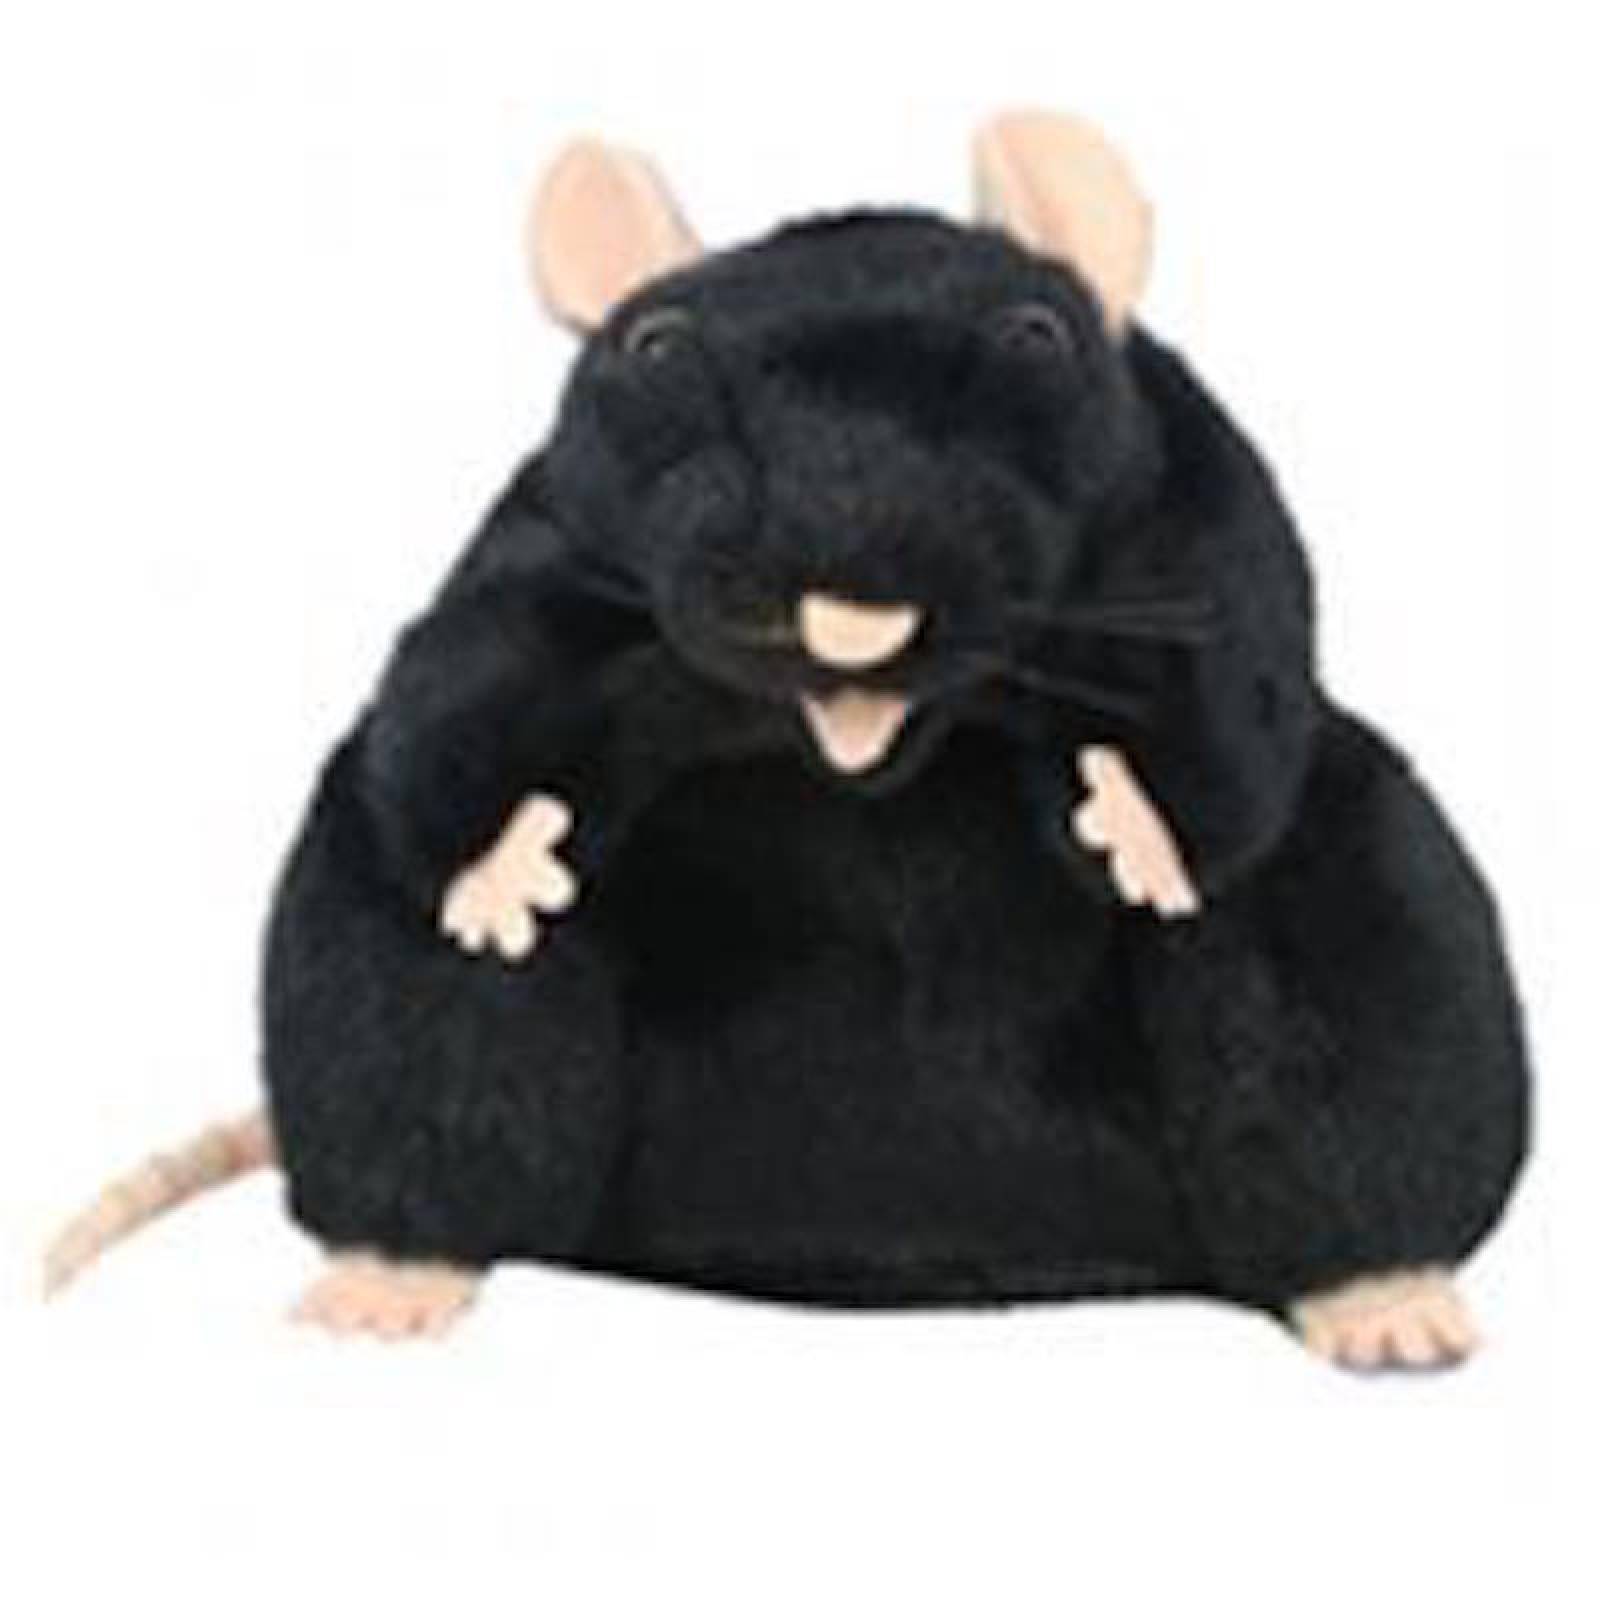 BLACK RAT Plump Glove Puppet European Wildlife